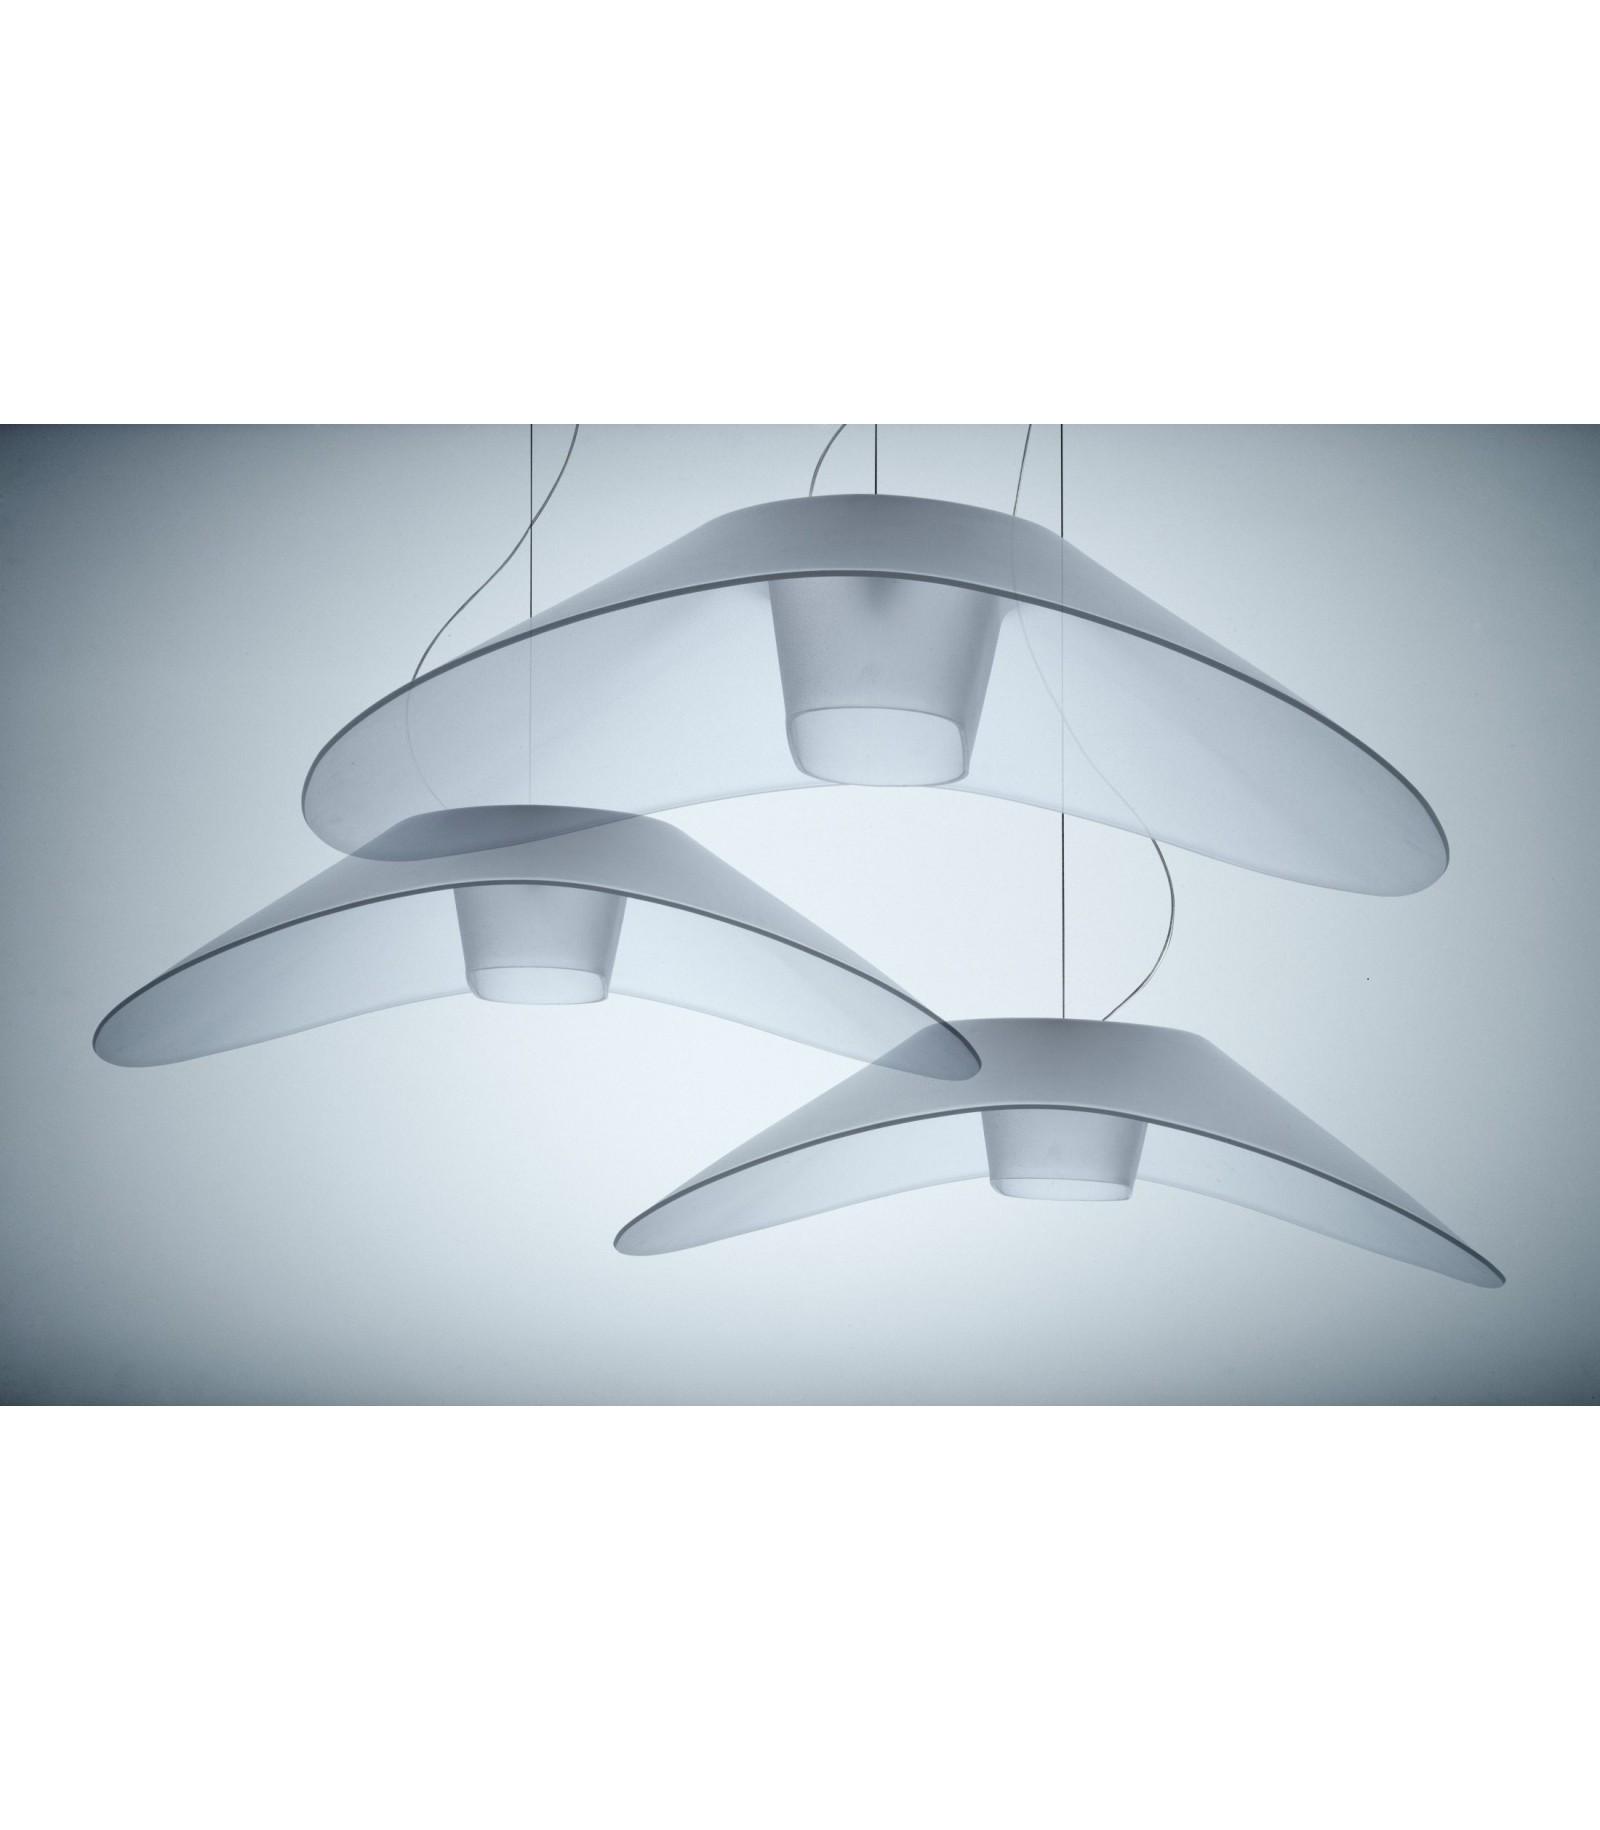 Fl Y Lampade A Sospensione Kartell Di Design In Bianco E ...